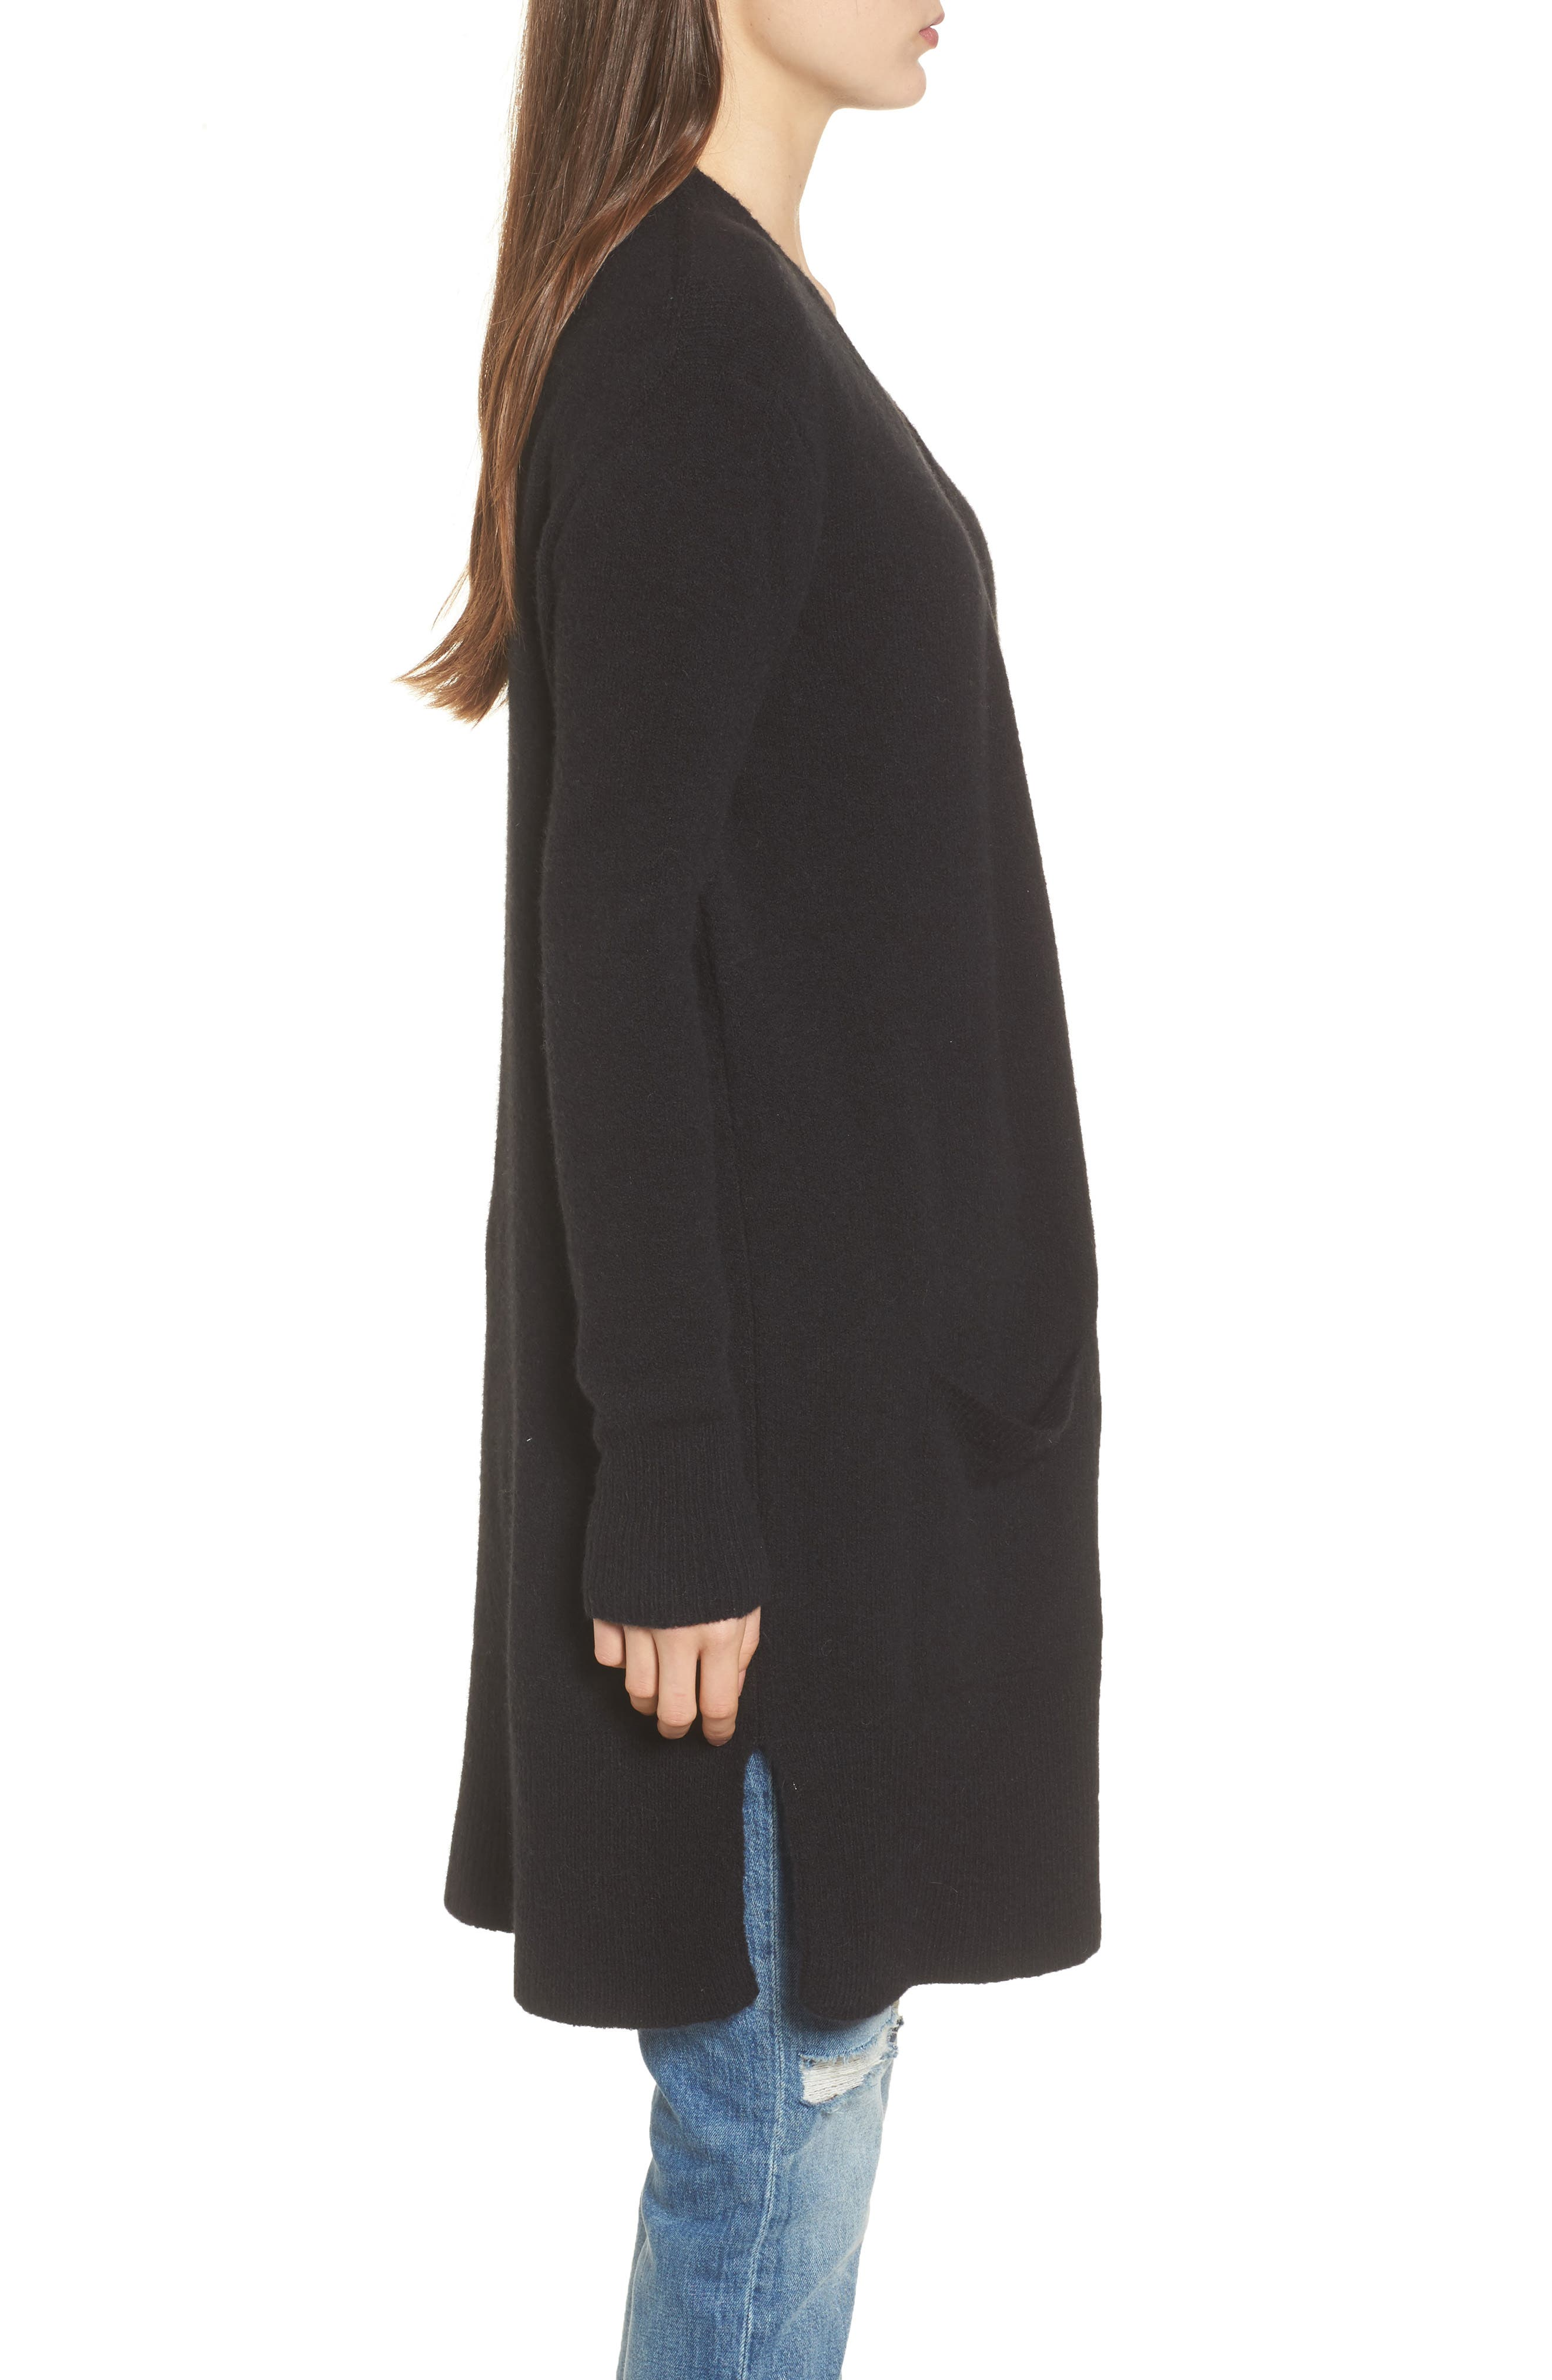 MADEWELL, Kent Cardigan Sweater, Alternate thumbnail 3, color, TRUE BLACK